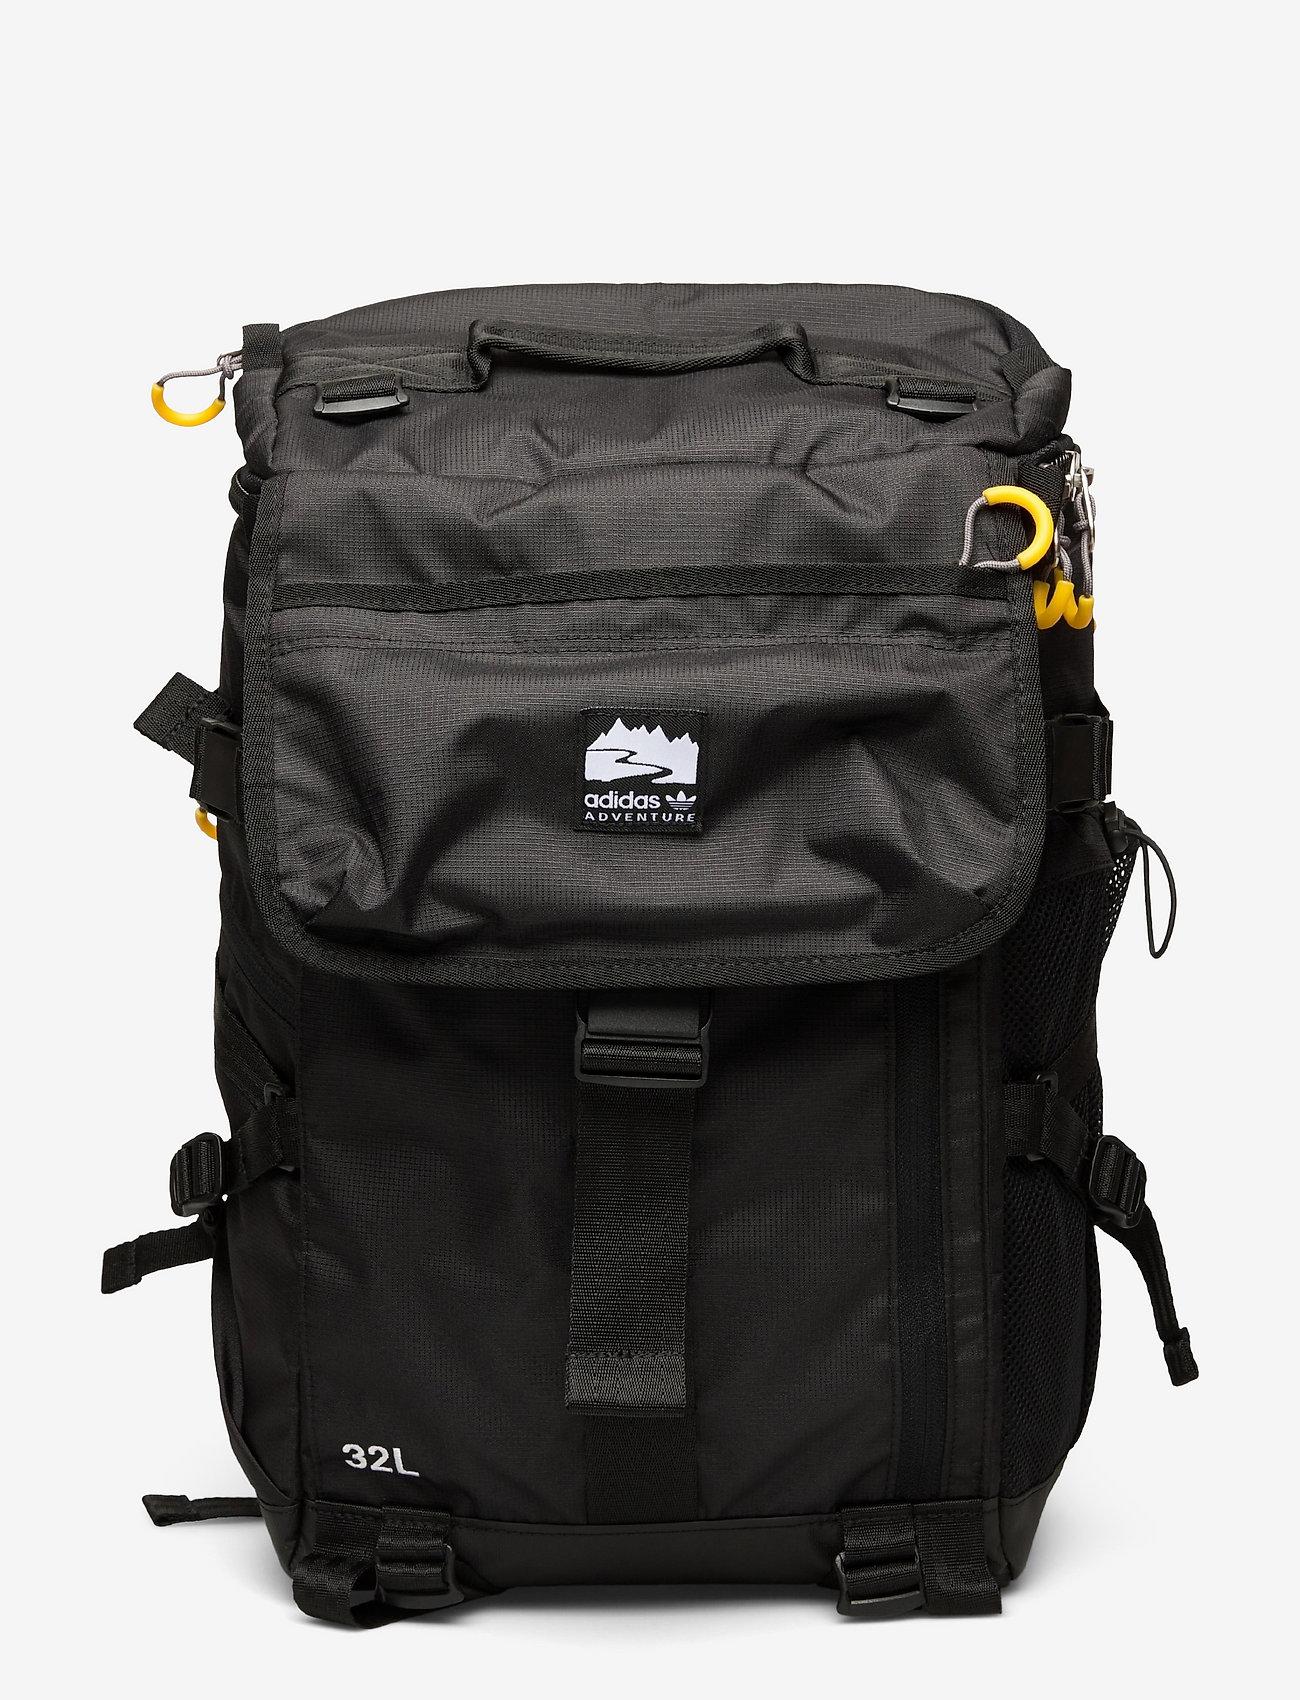 adidas Originals - Adventure Top Loader Bag - nyheter - black/gloprp/white - 0